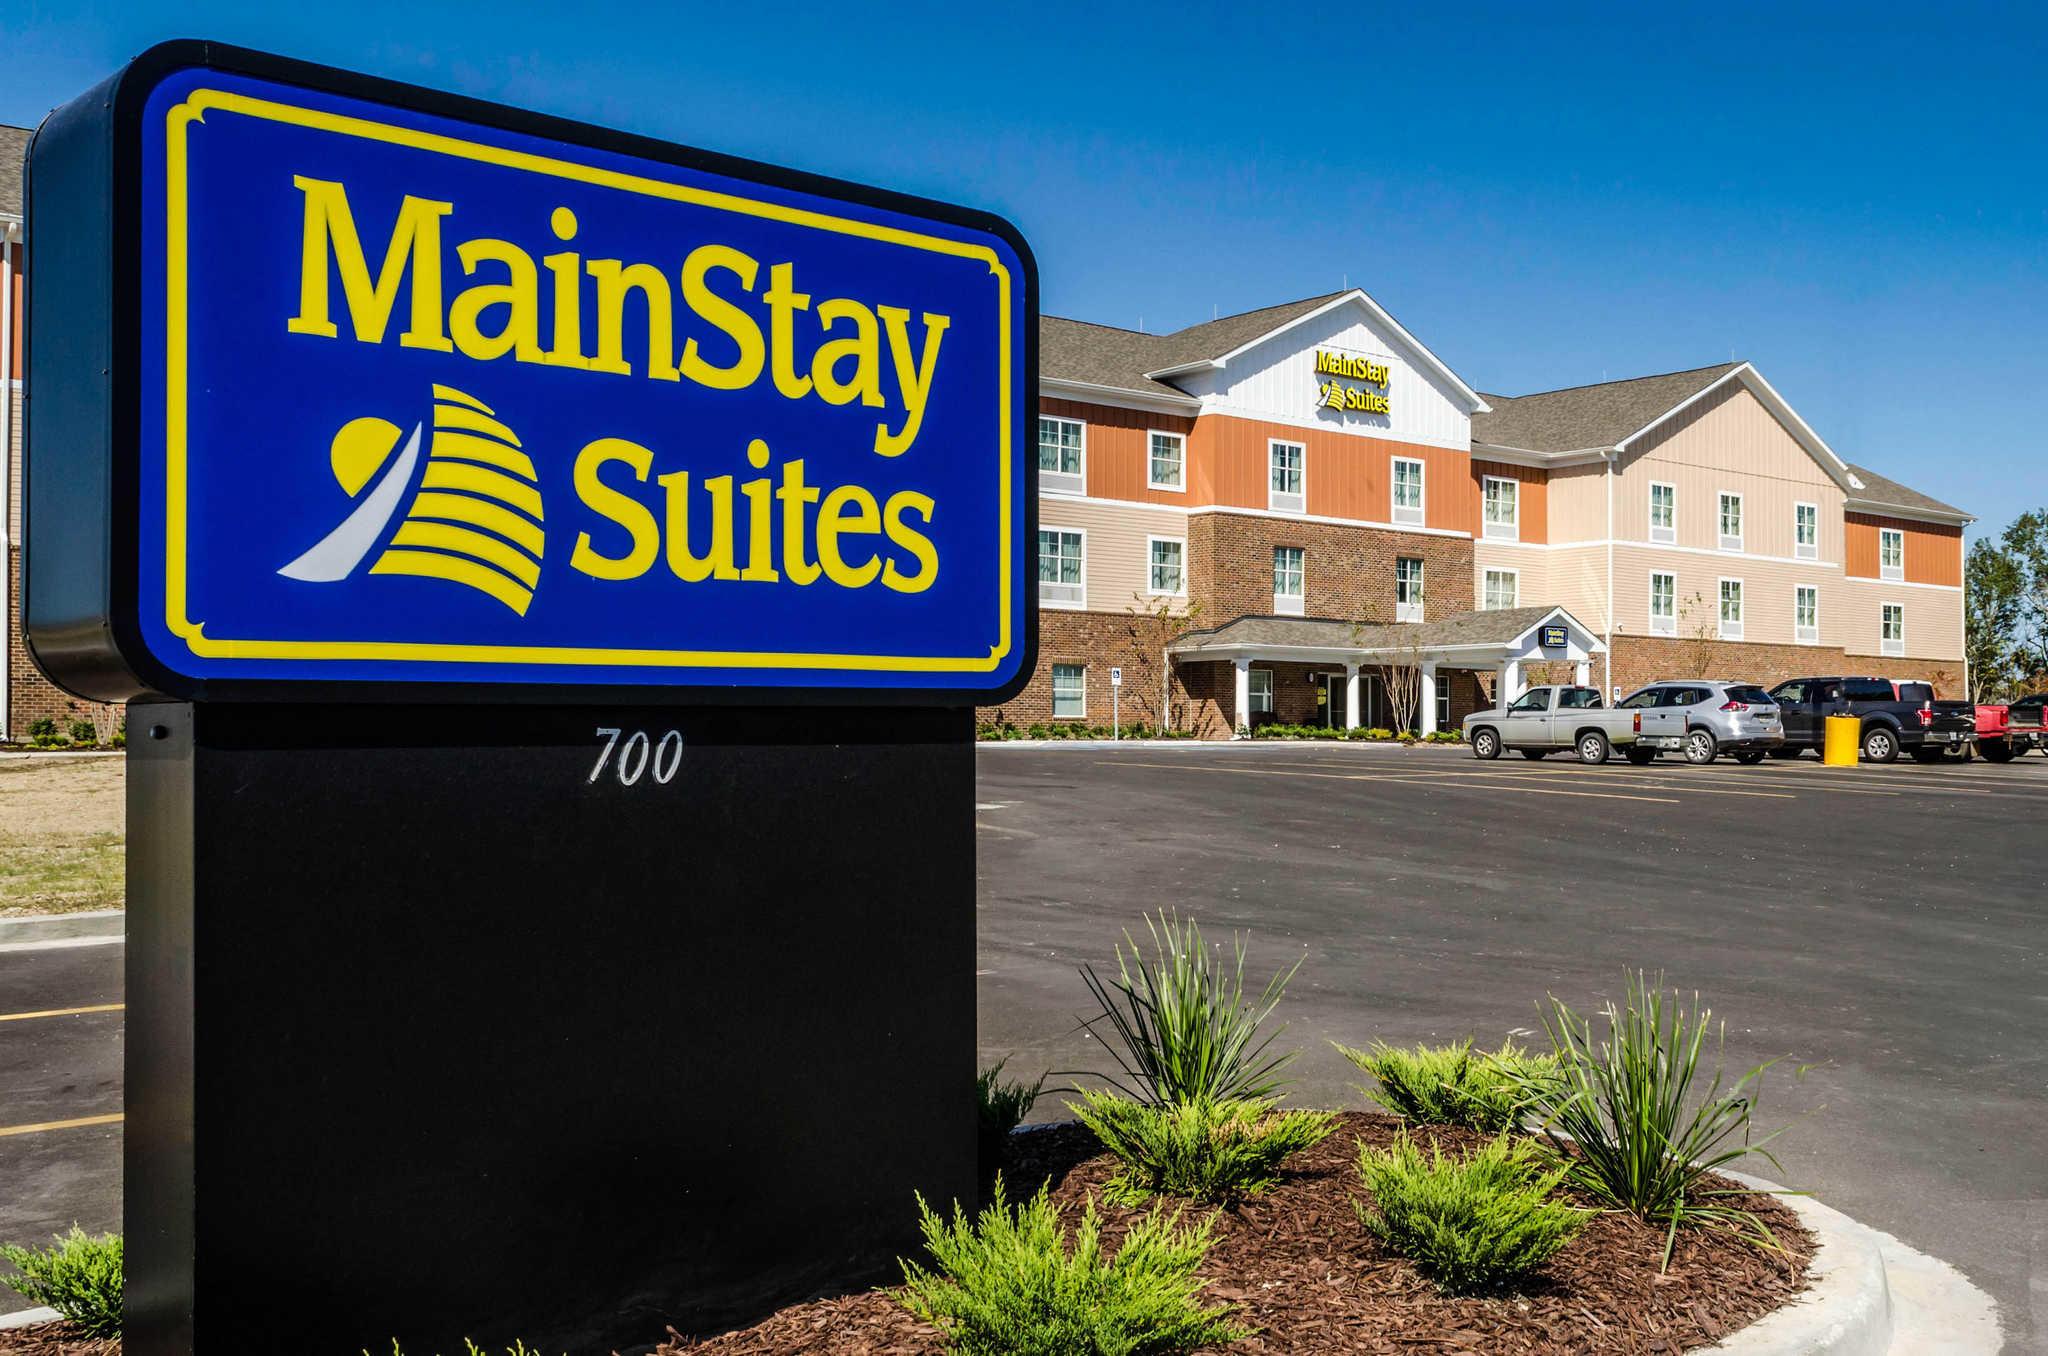 MainStay Suites Hackberry Sportsman's Lodge image 2